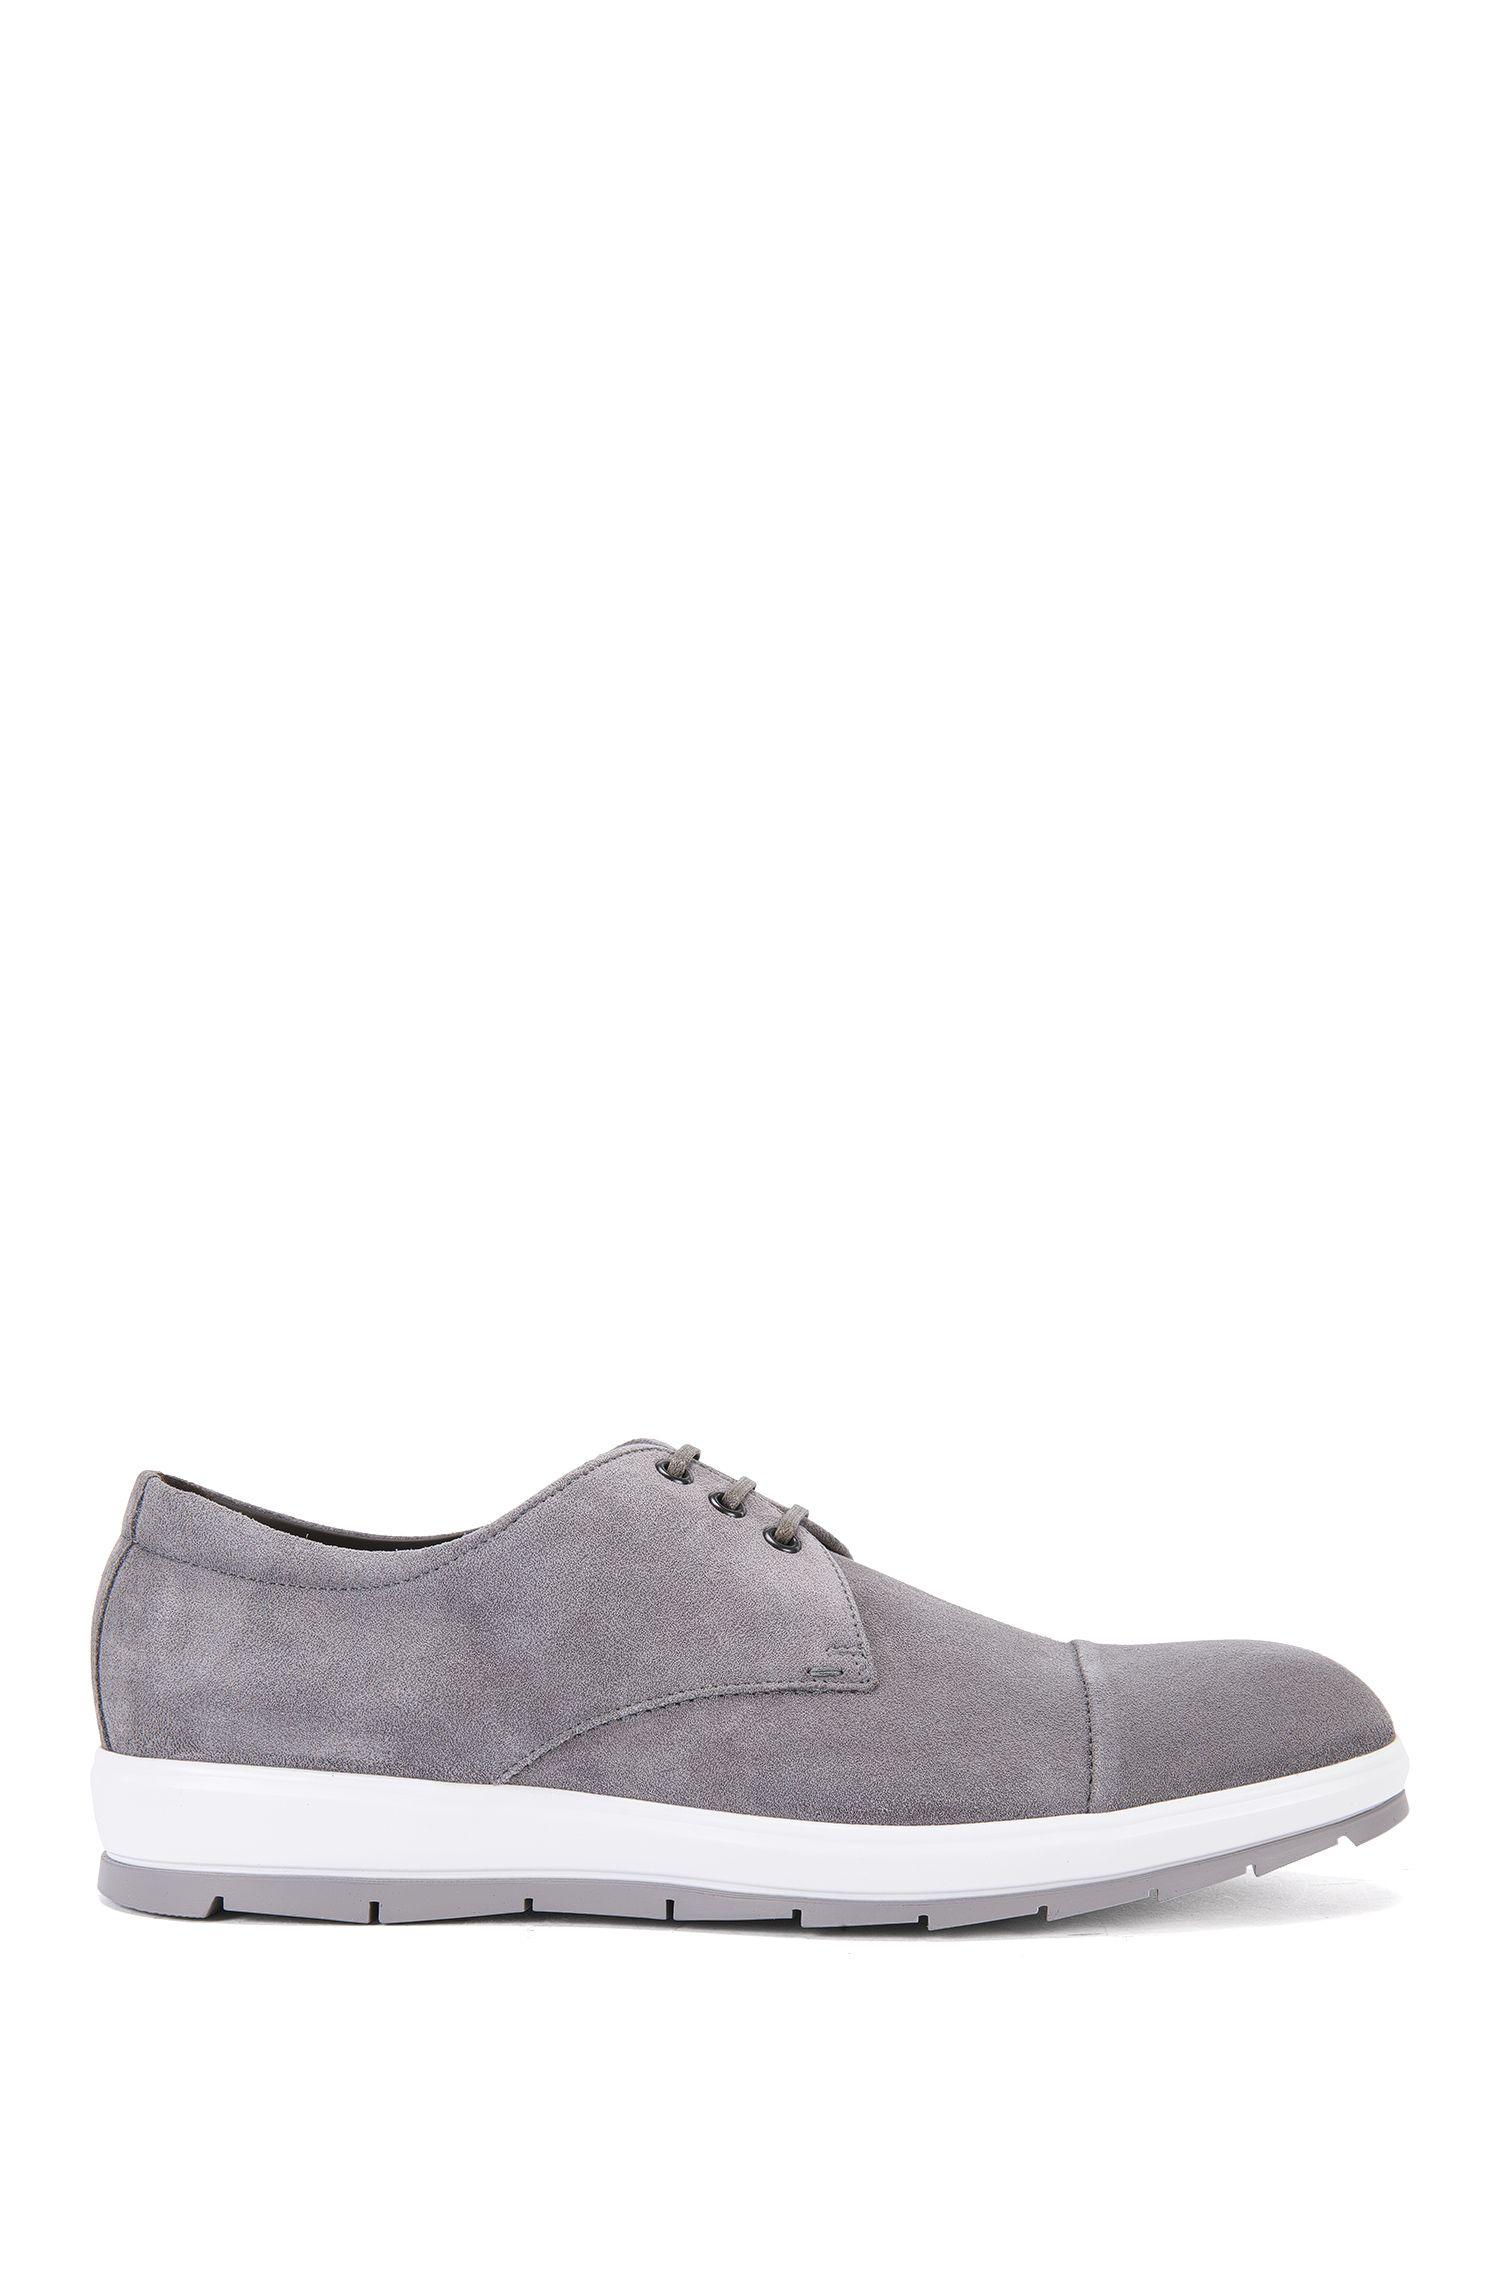 'Icon Derb Sdct' | Italian Calfskin Derby Shoes